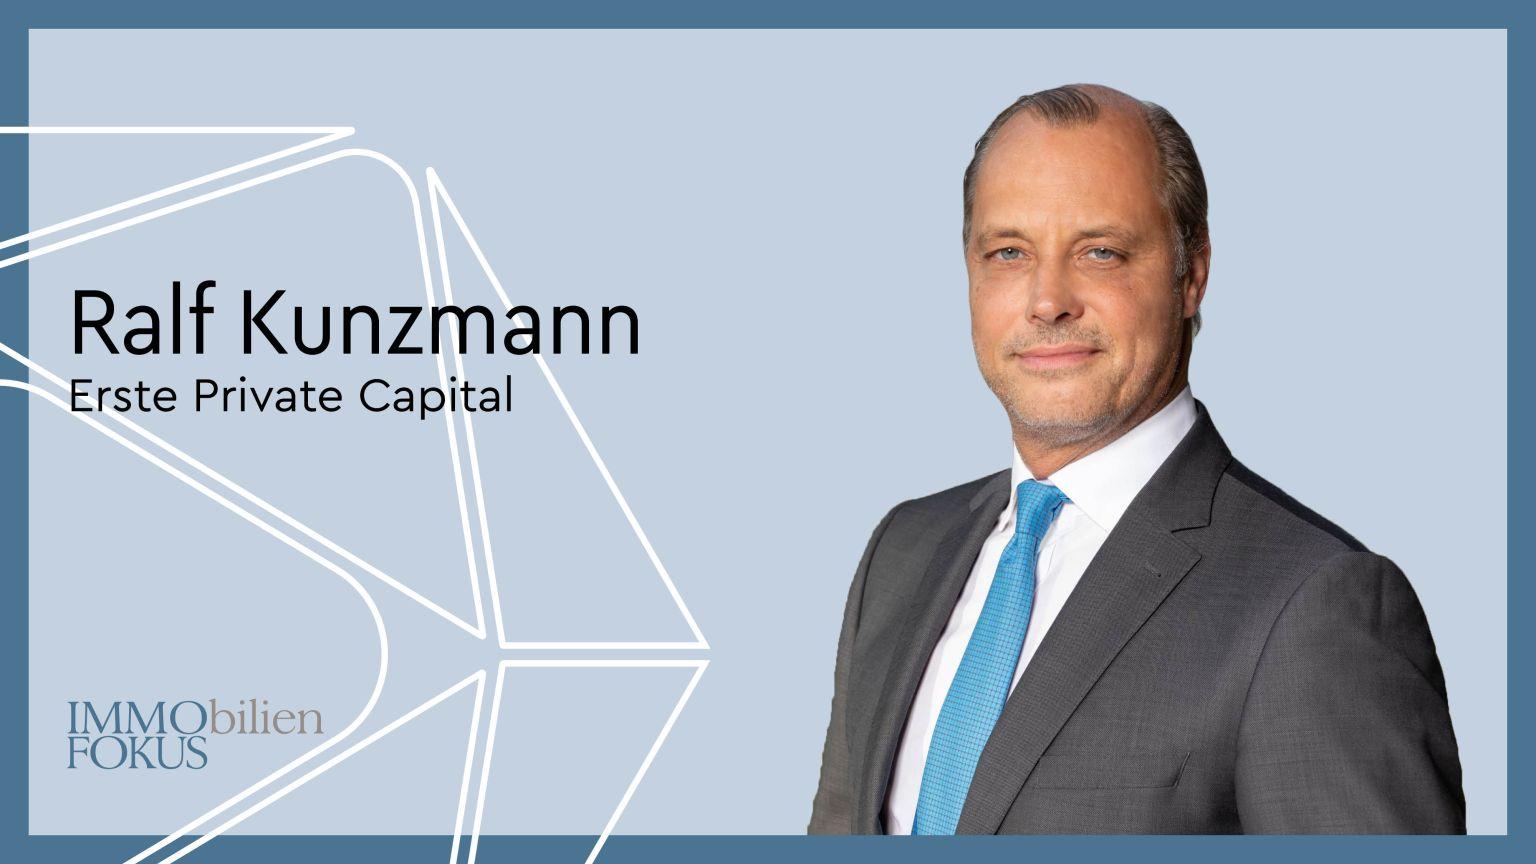 Ralf Kunzmann ergänzt die Geschäftsführung der Erste Private Capital